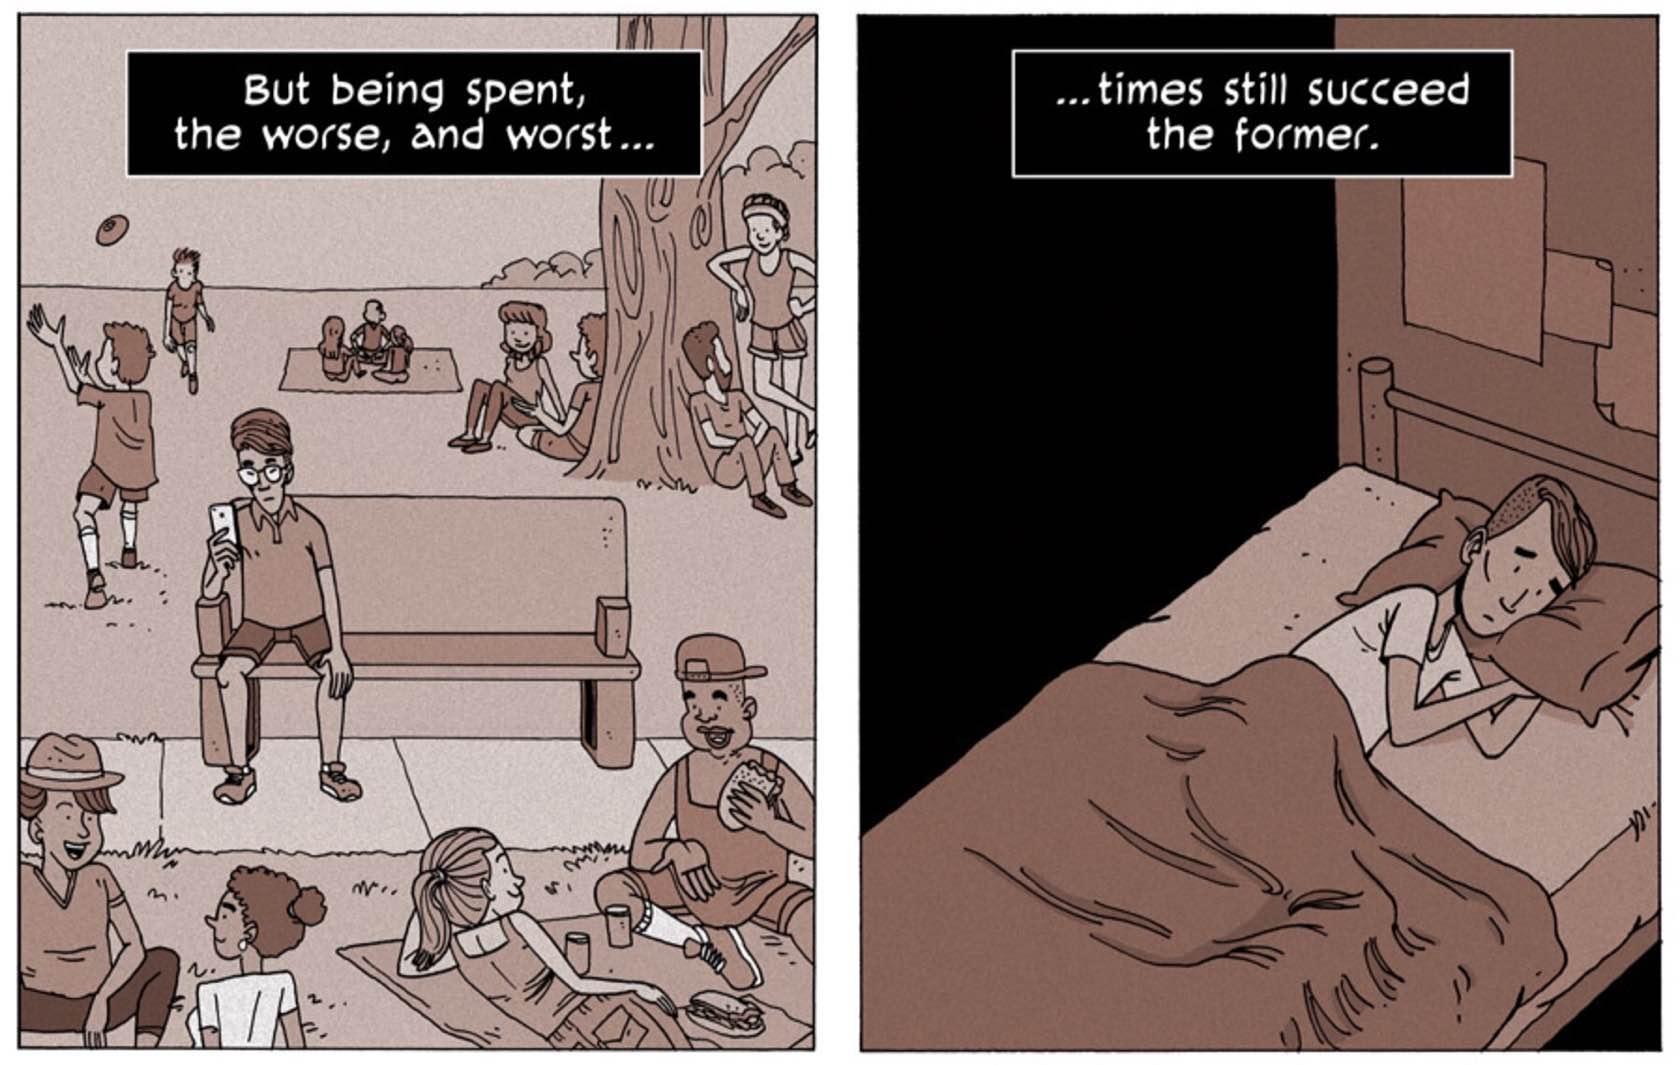 Illustration: Gavin Aung Than